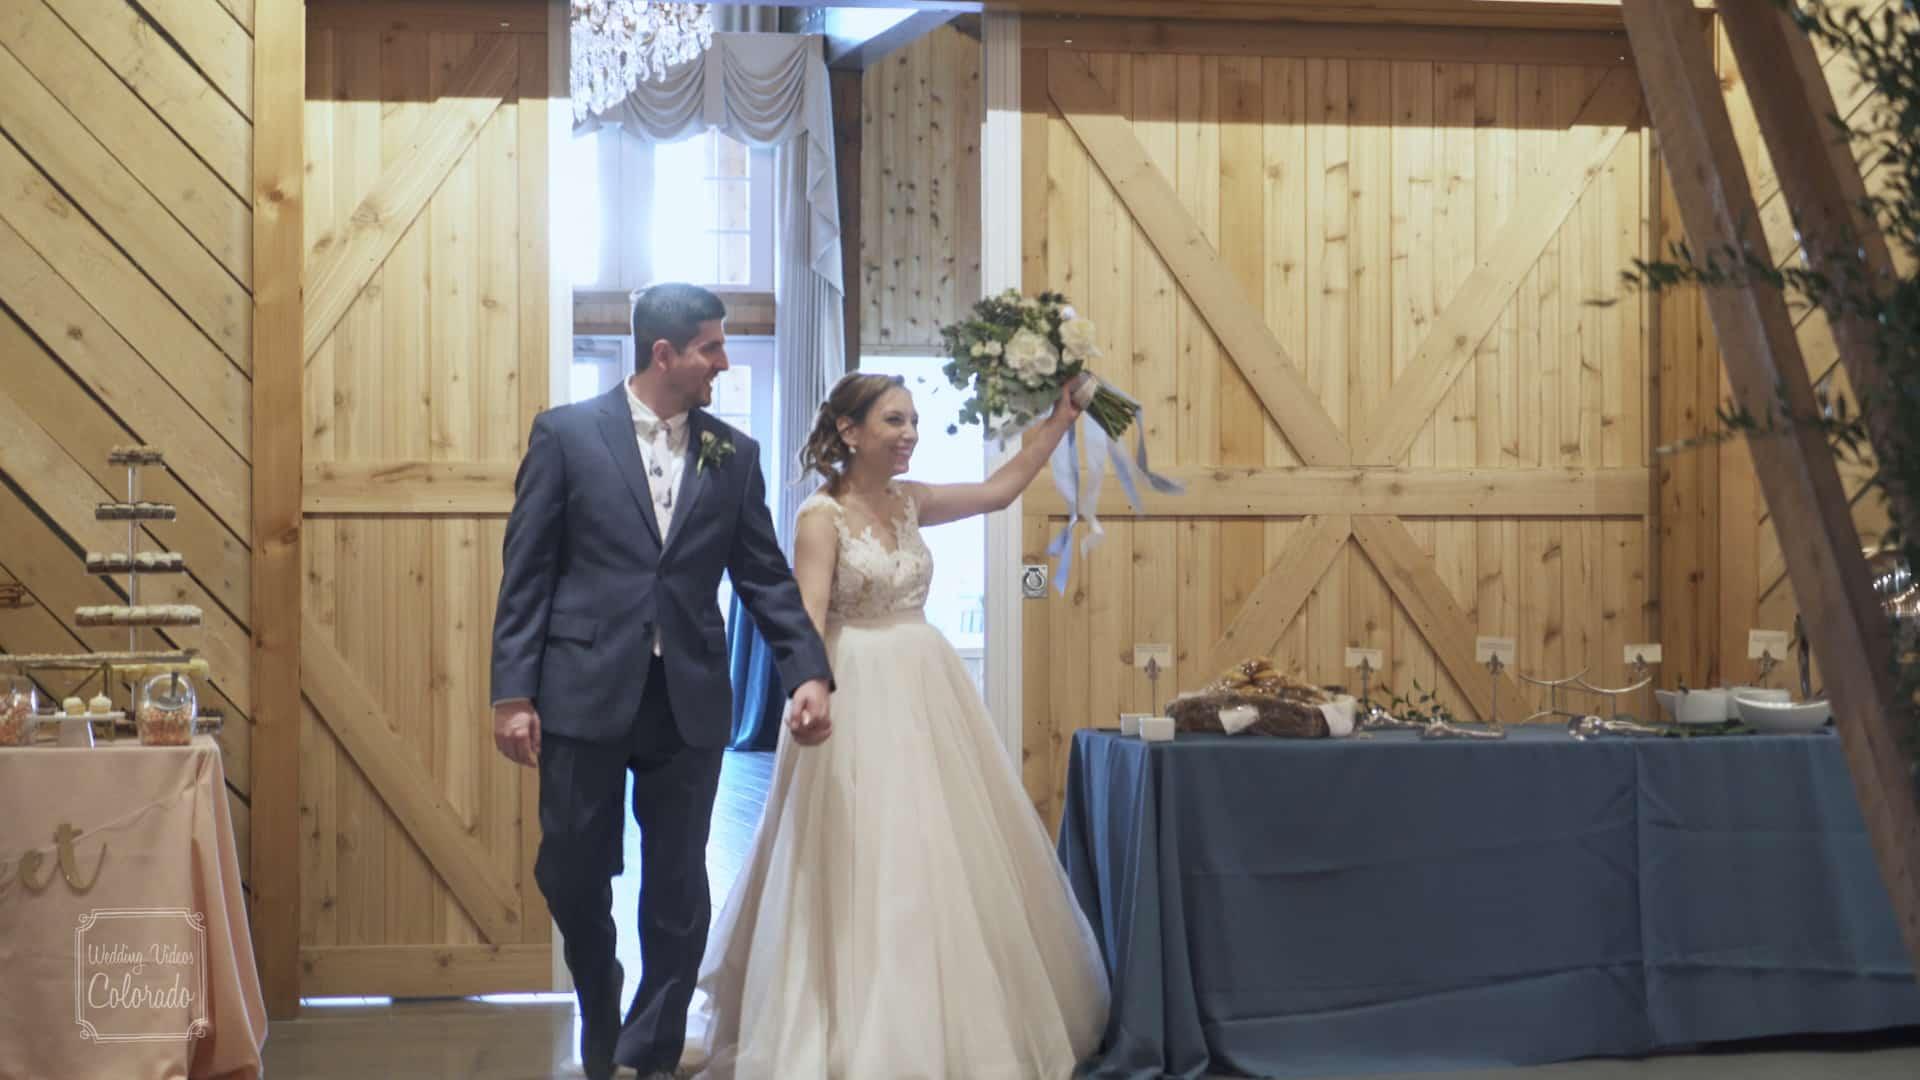 Tony Steph Wedding Still The Lodge at Mount Ida Charlottesville Virginia